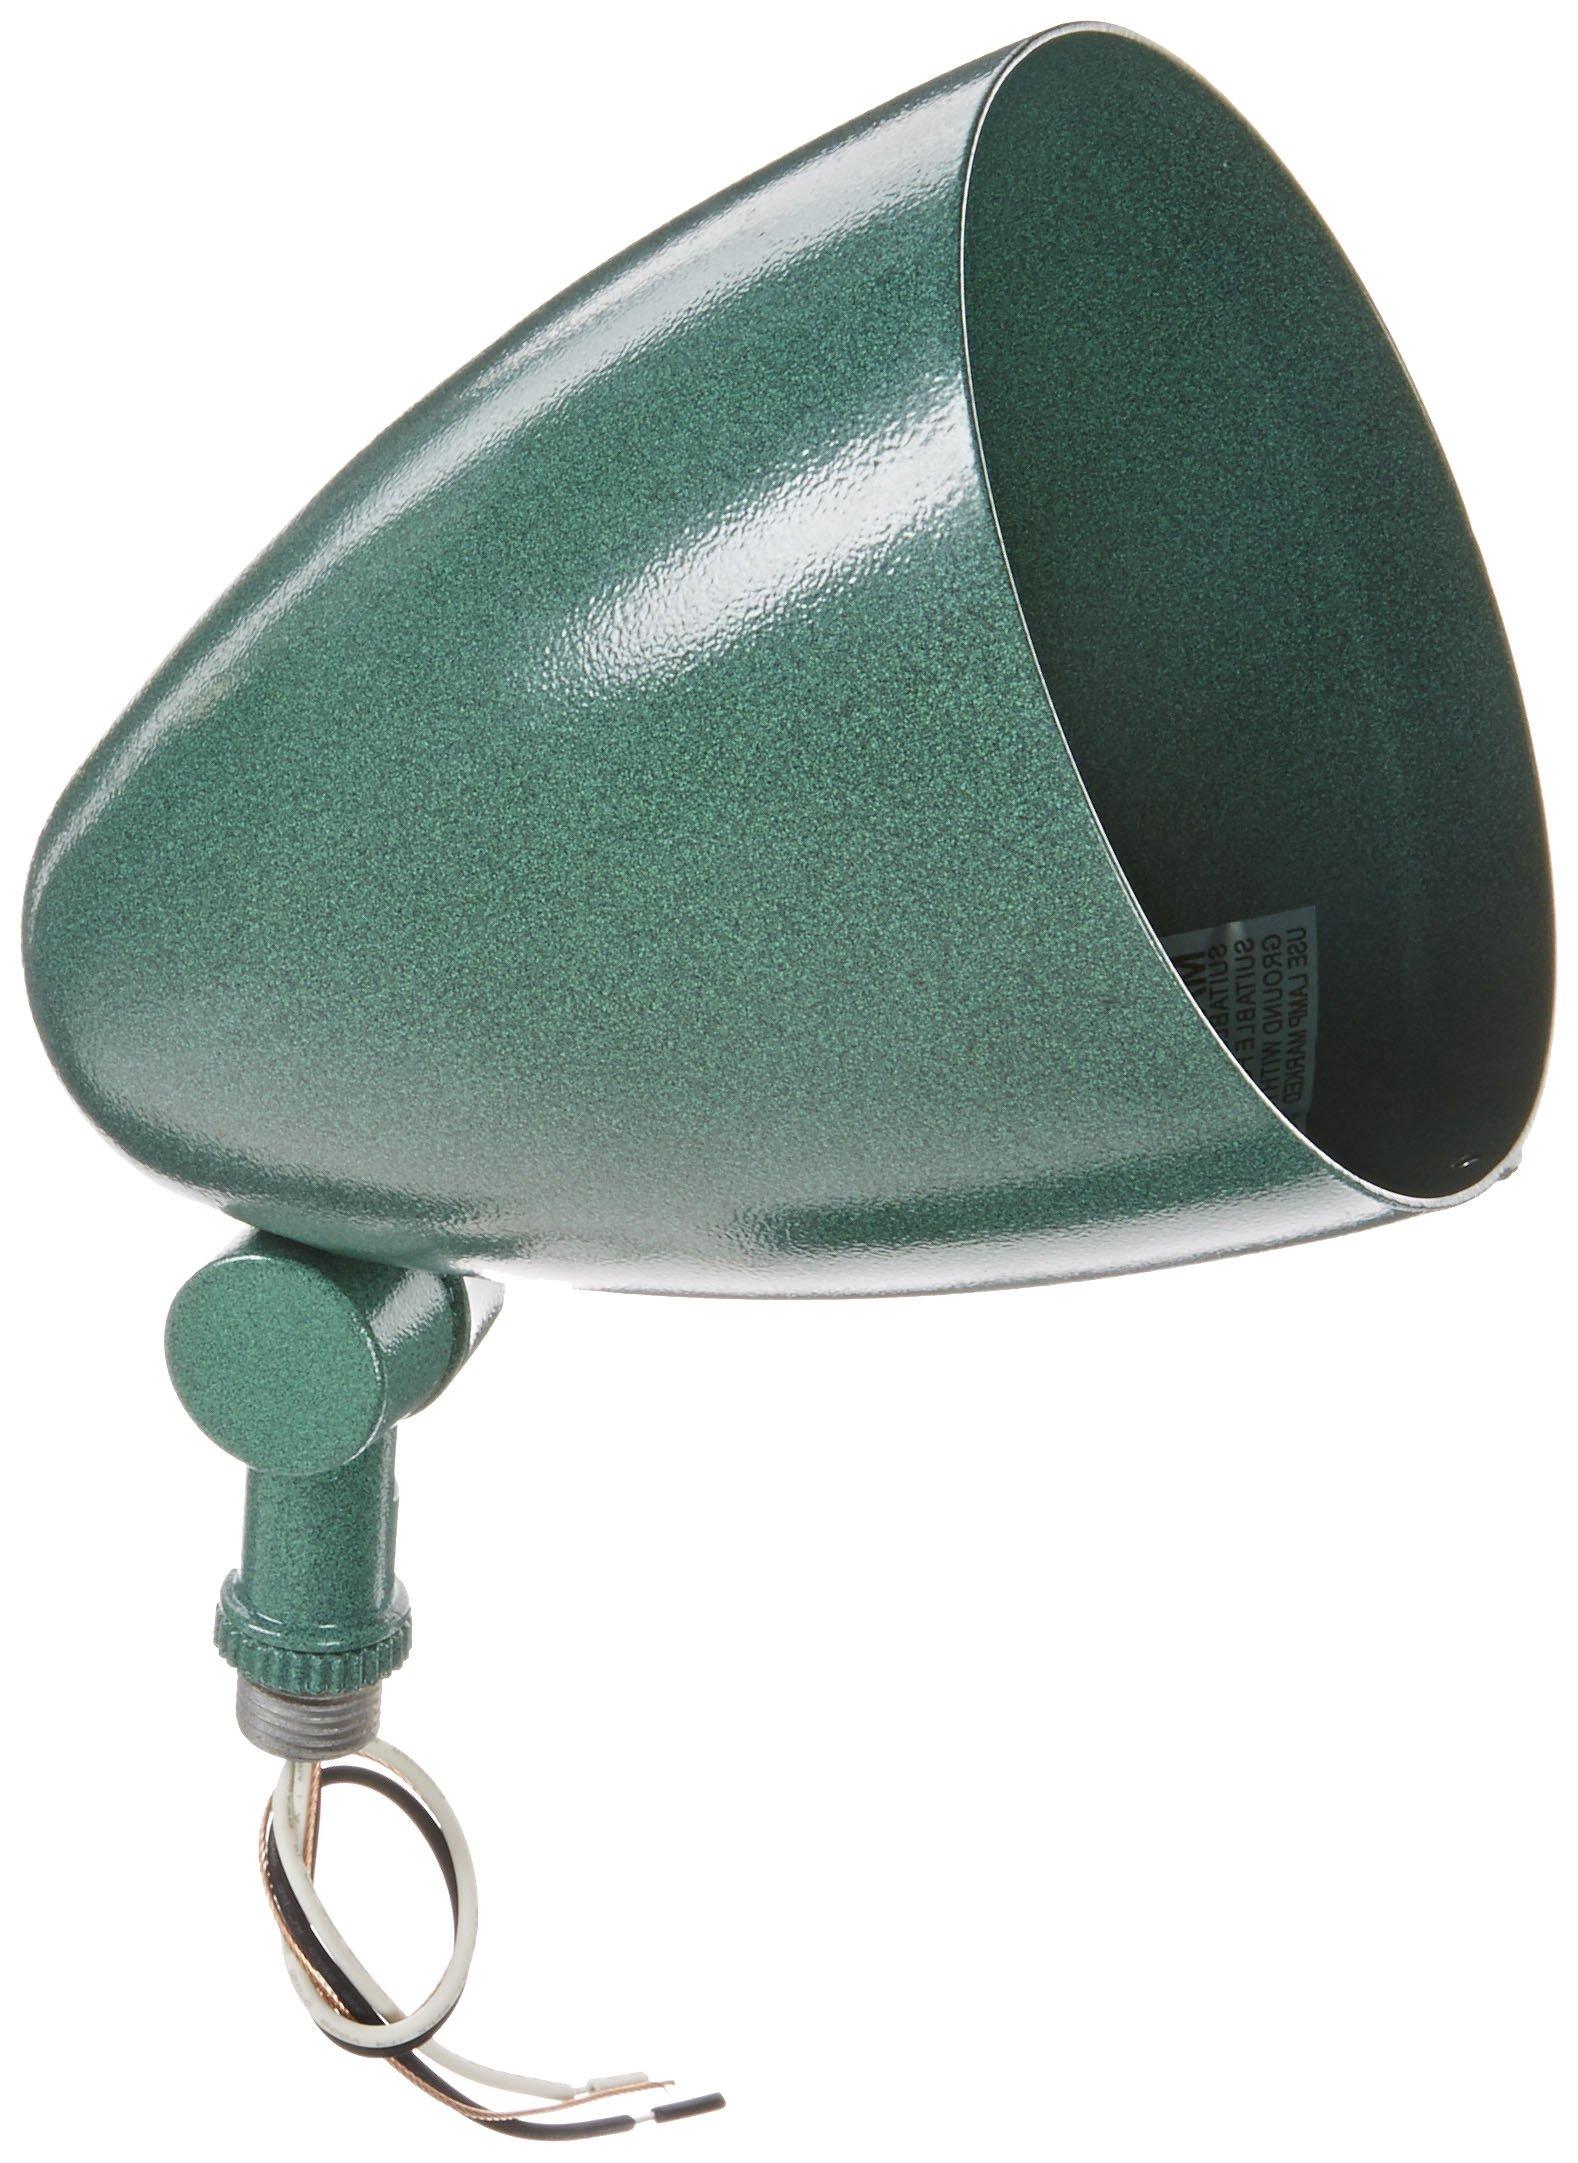 RAB Lighting HB101VG Bullet Shape Par Floodlight, PAR38 Type, Aluminum, 150W Power, Verde Green